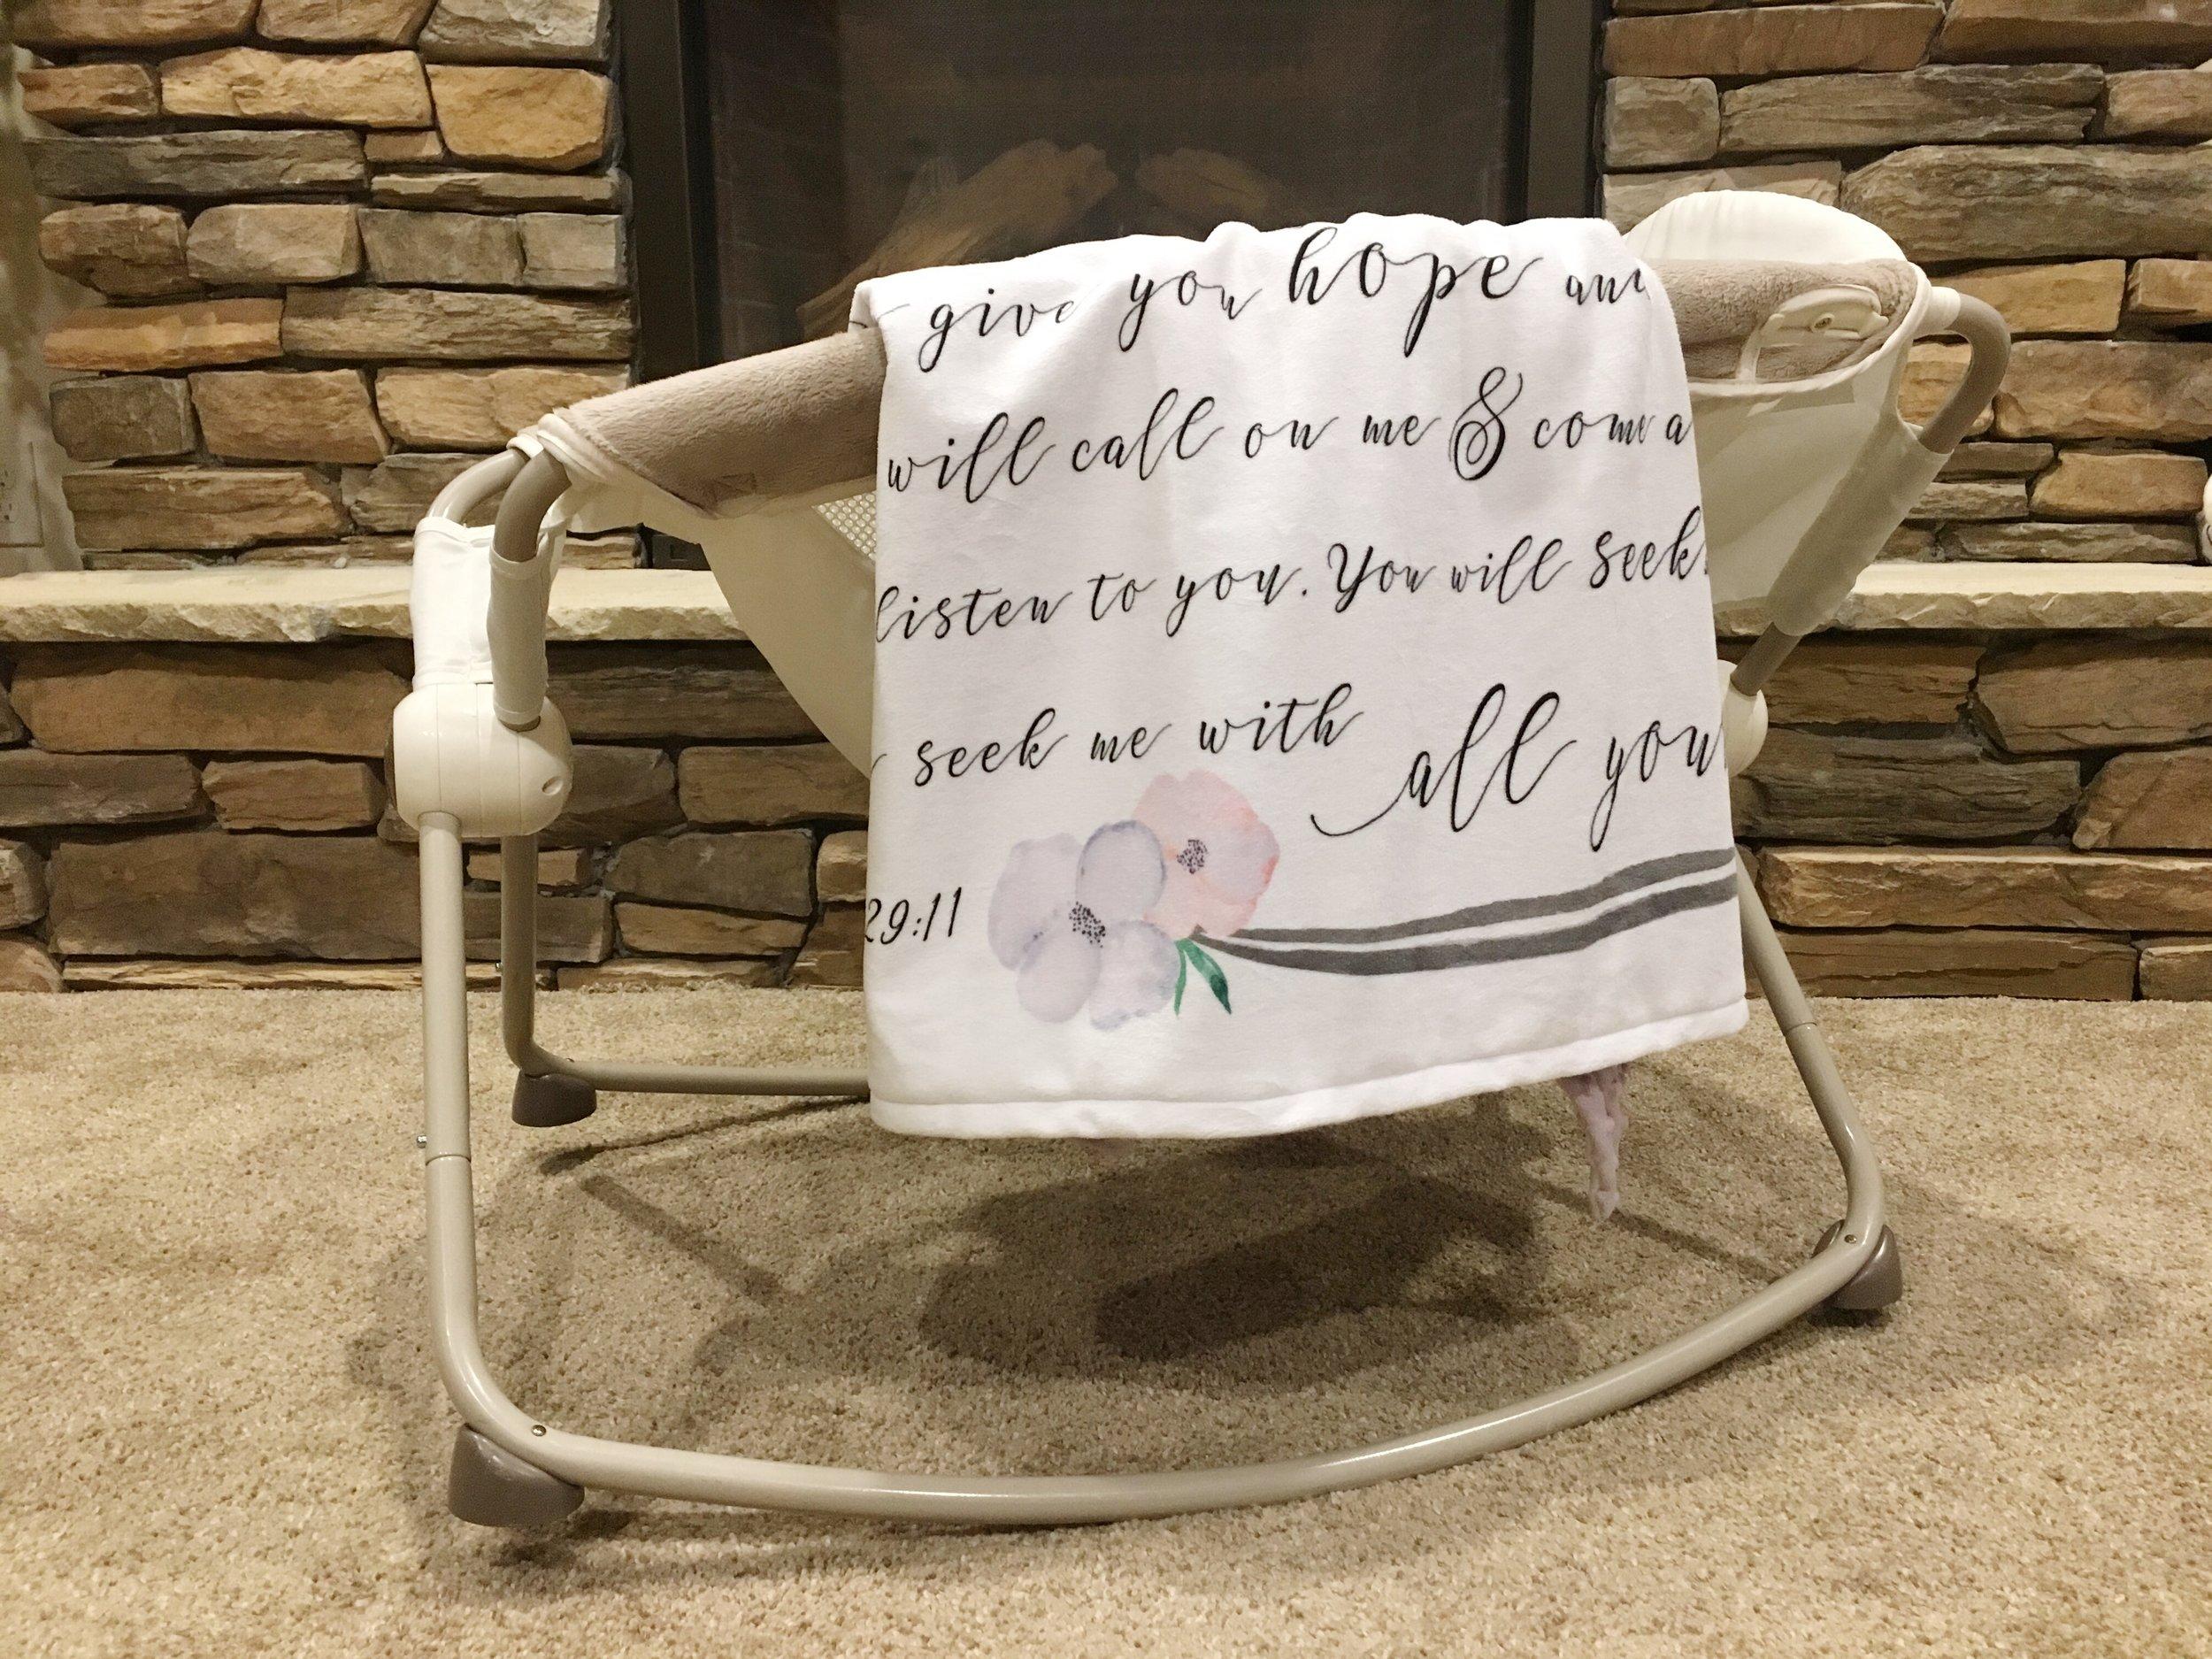 Central PA, Baby Blanket, Hand lettered, JesSmith Designs, Invitations, custom-04-15 06.21.31.jpg